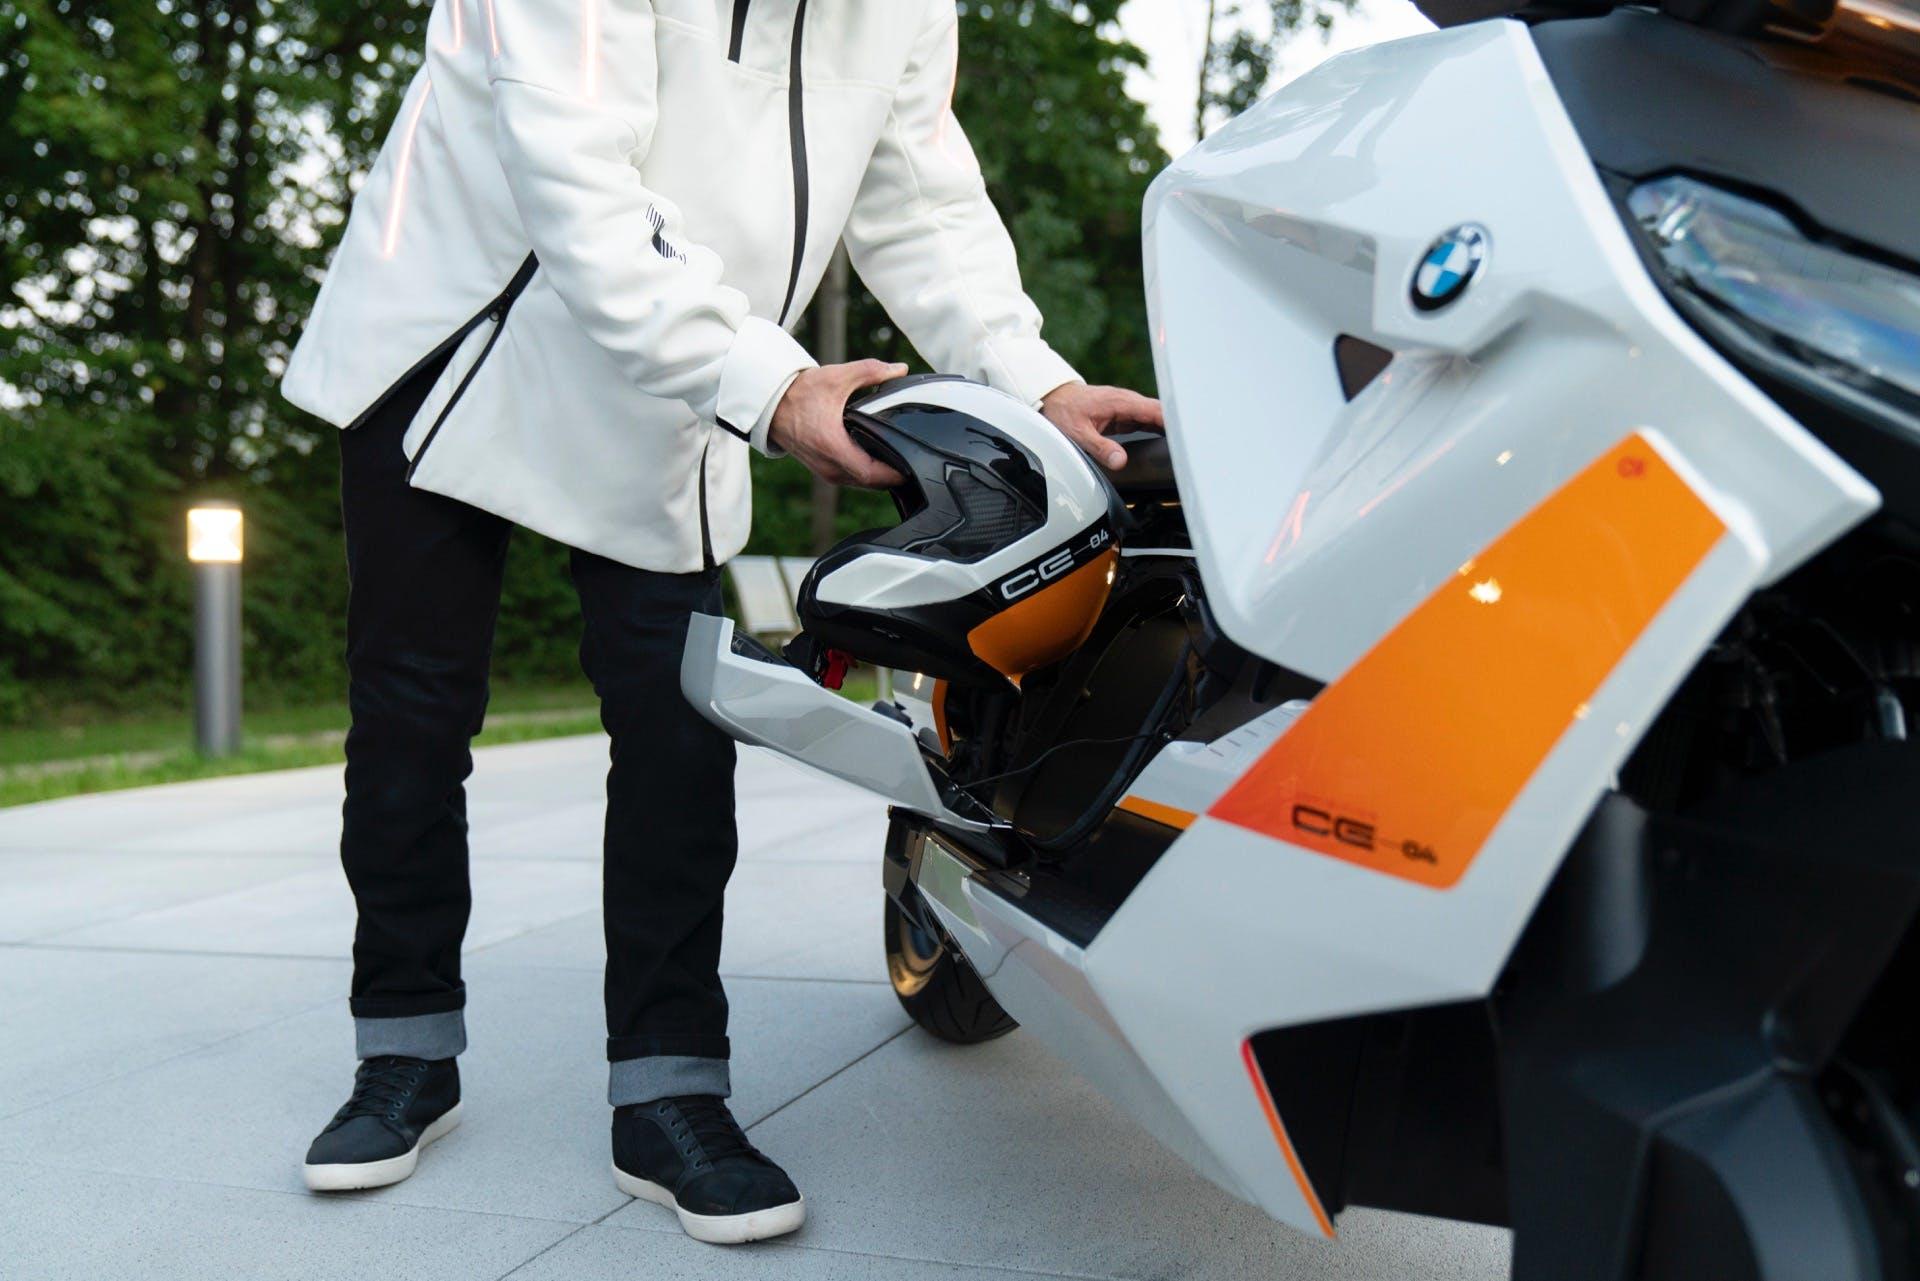 BMW Motorrad Definition CE 04 vano sottosella